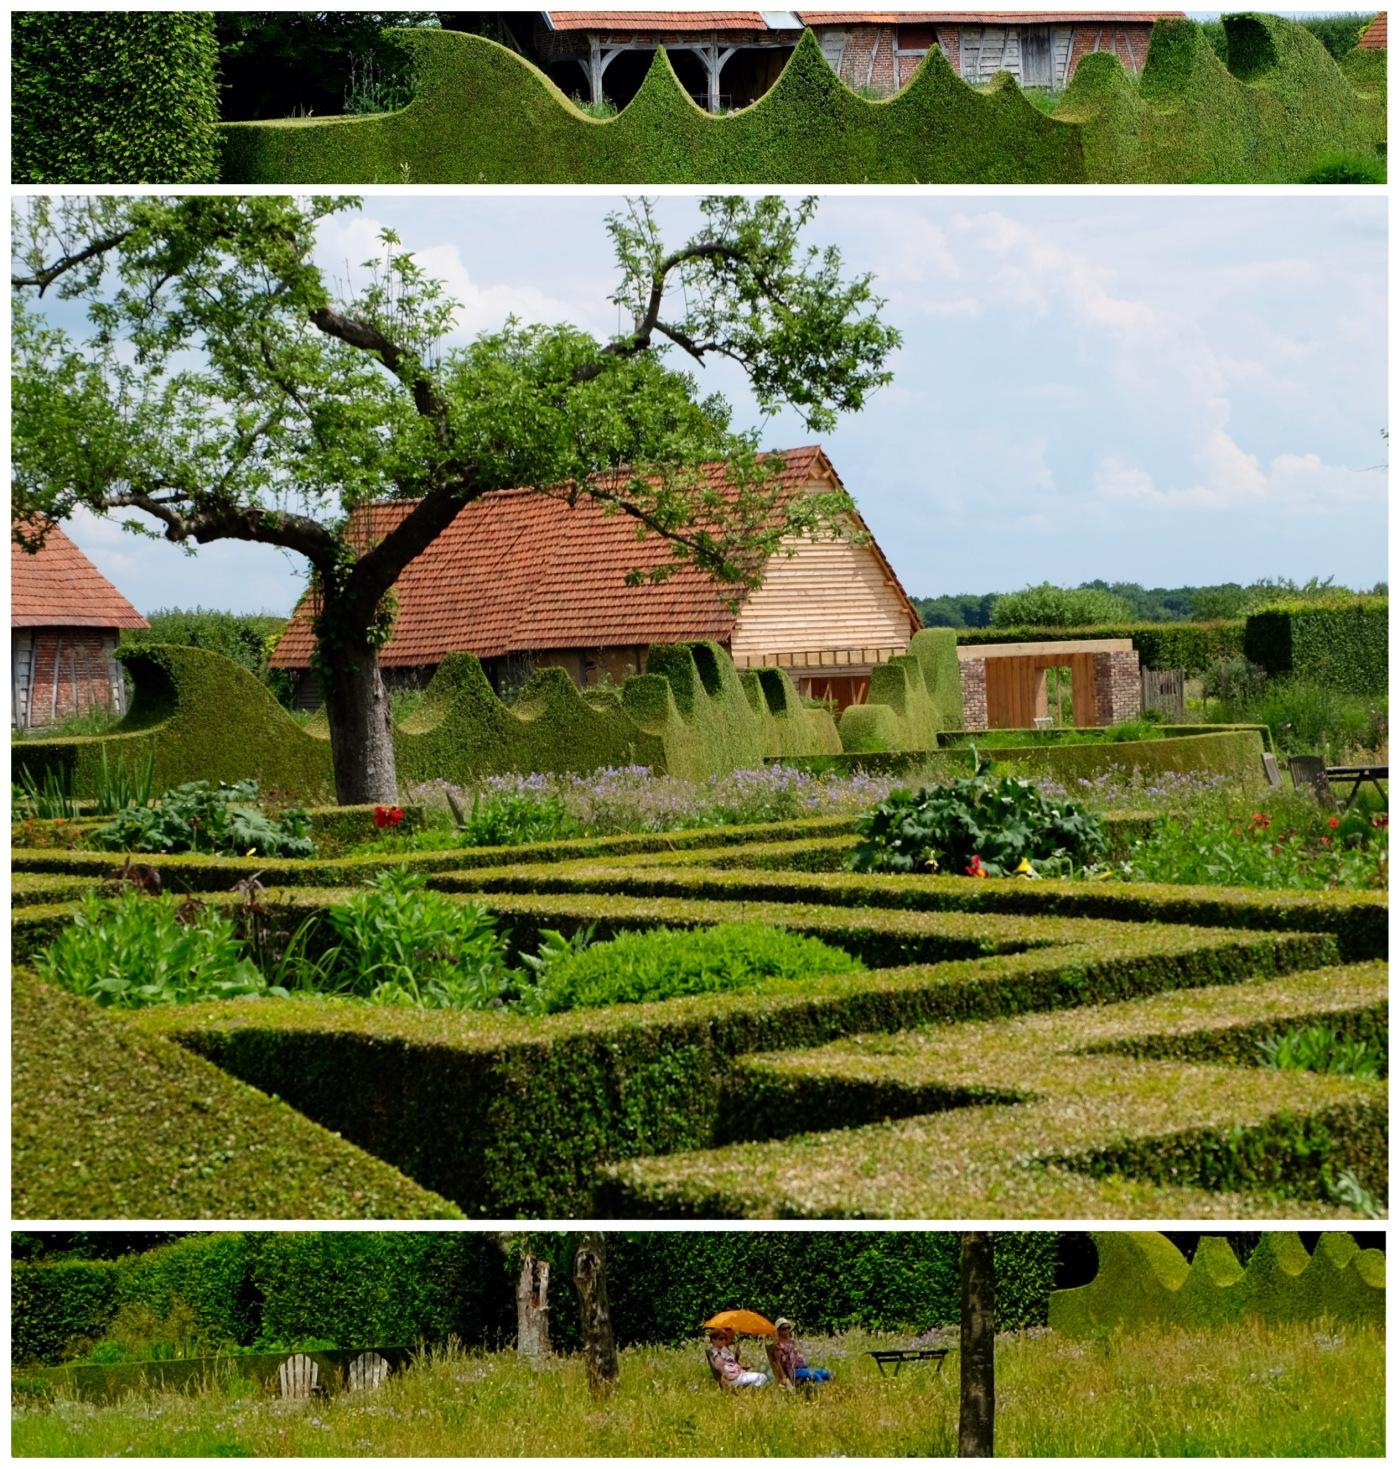 Visit le jardin plume springhill stories for Le jardin plume